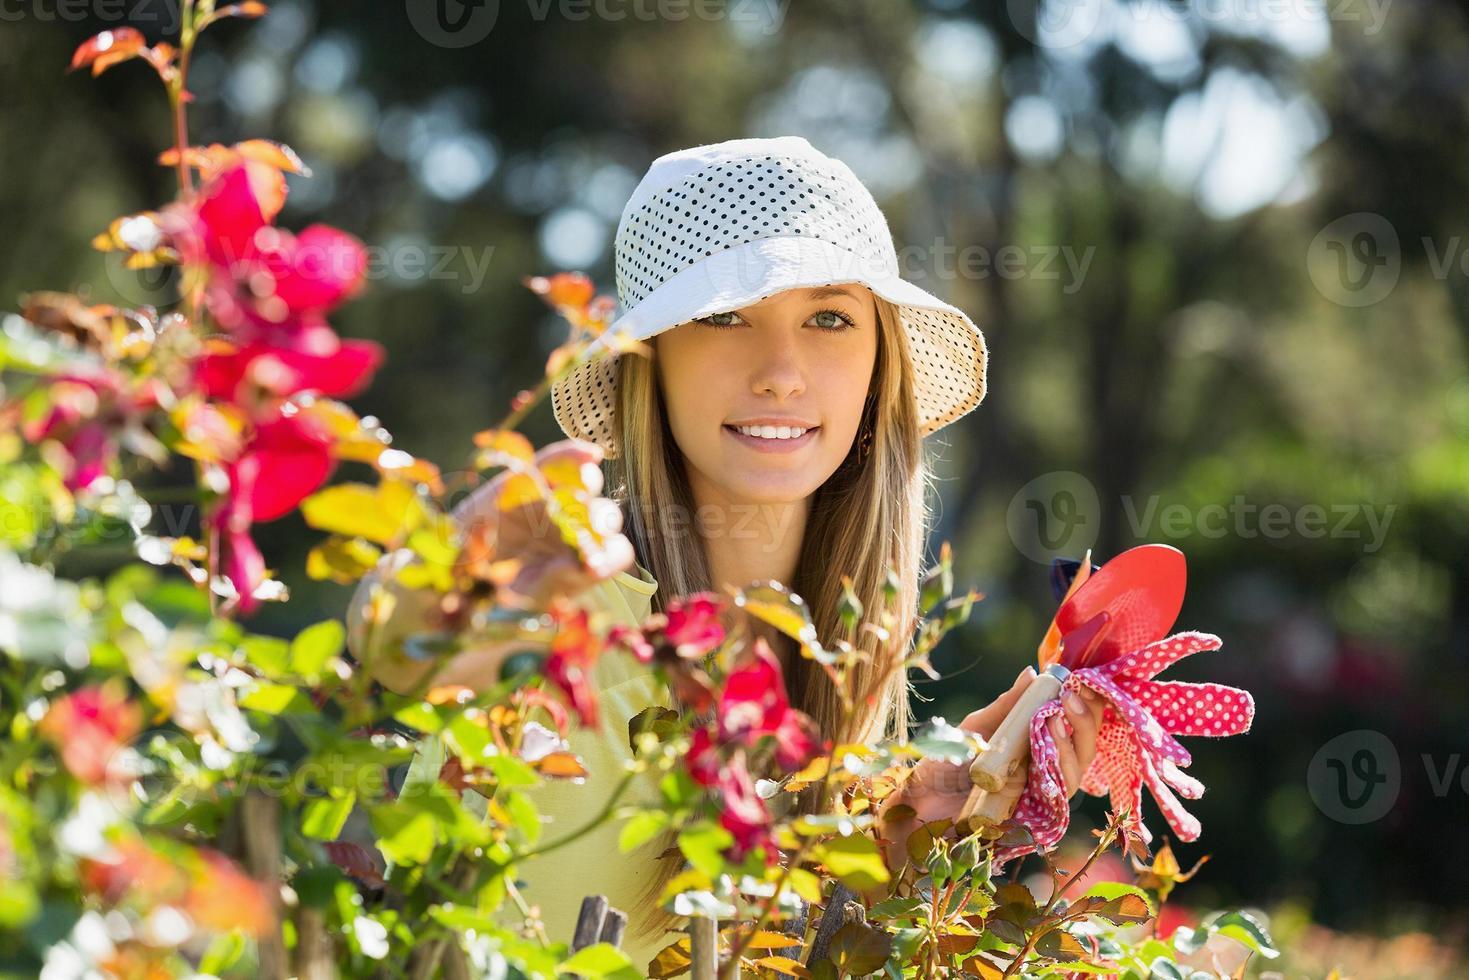 fêmea feliz na jardinagem quintal foto